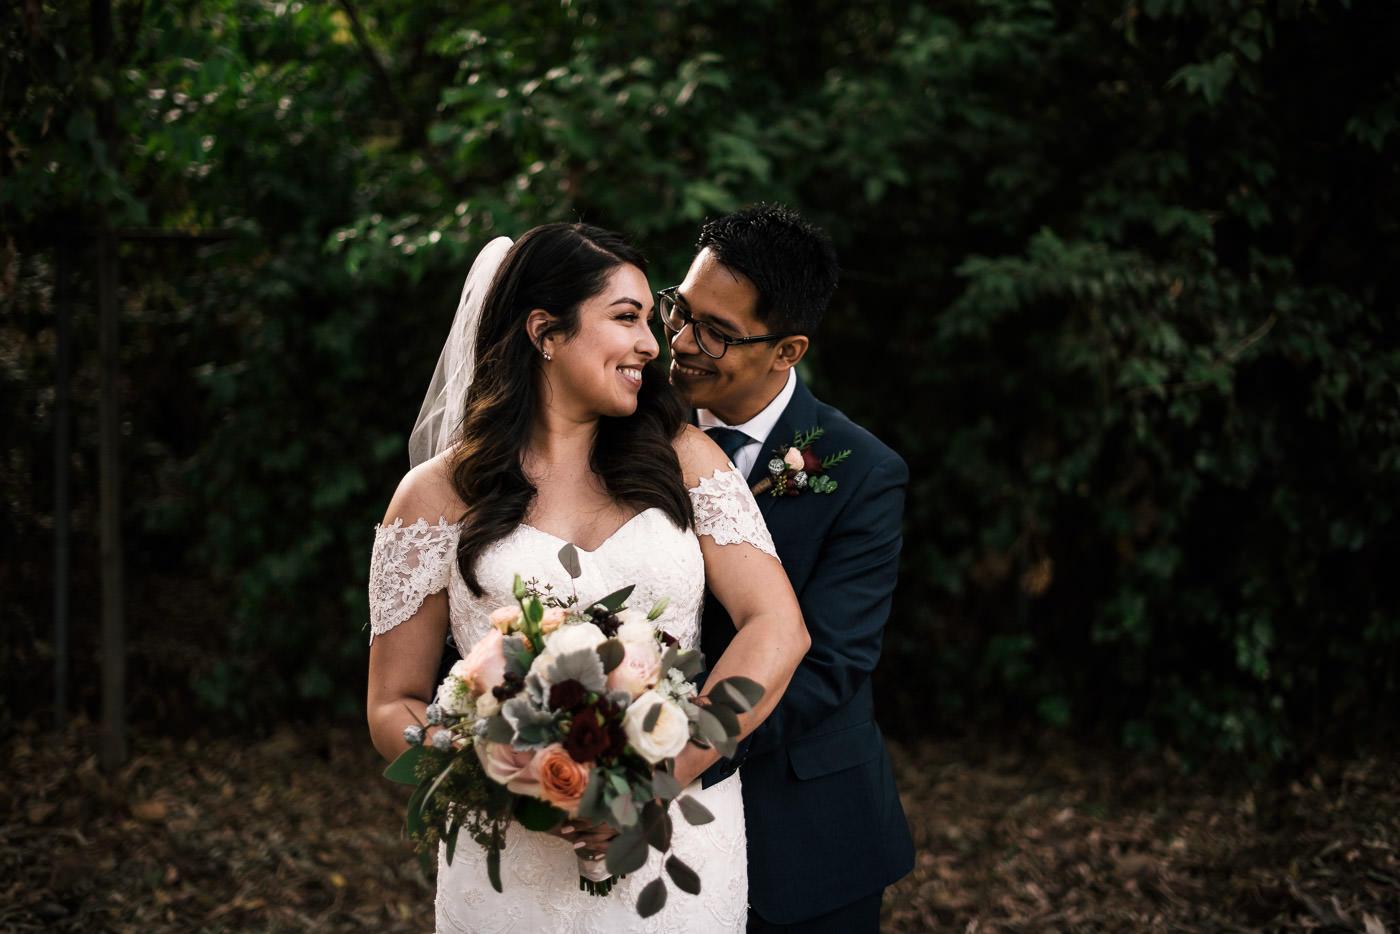 Best wedding photographer near Granada Hills.